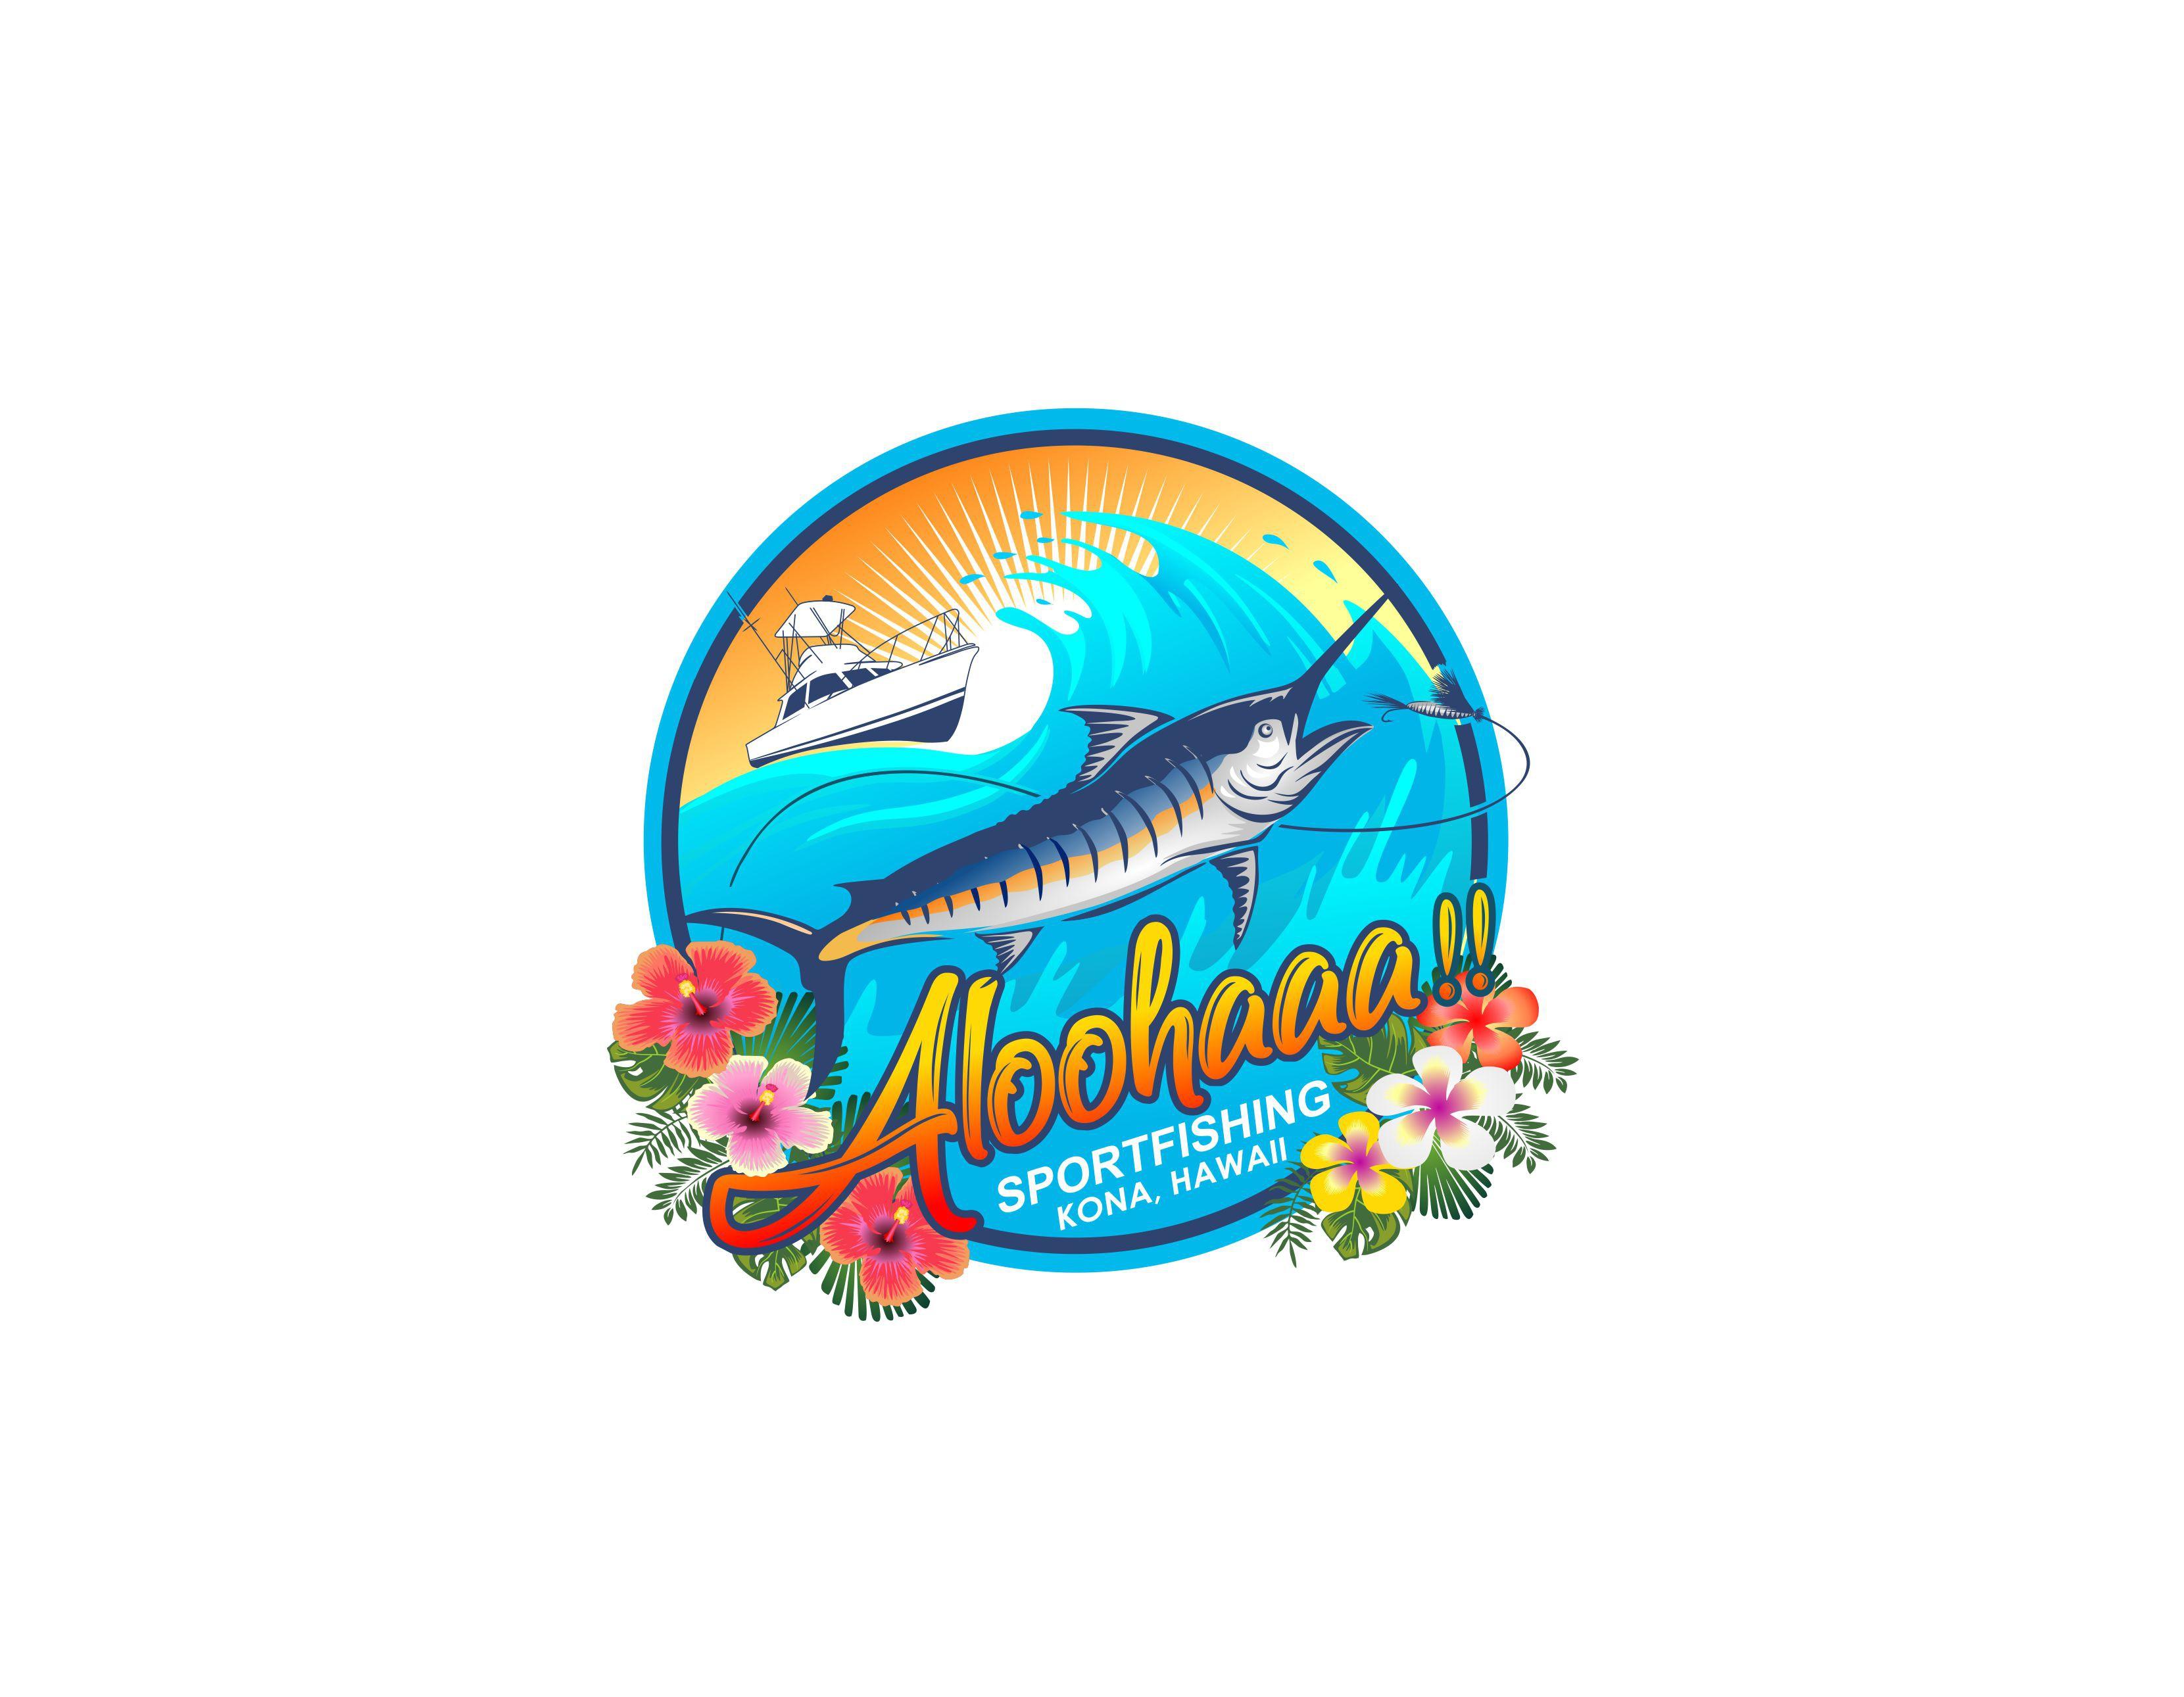 Design a little aloha for Aloohaaa!! Sportfishing